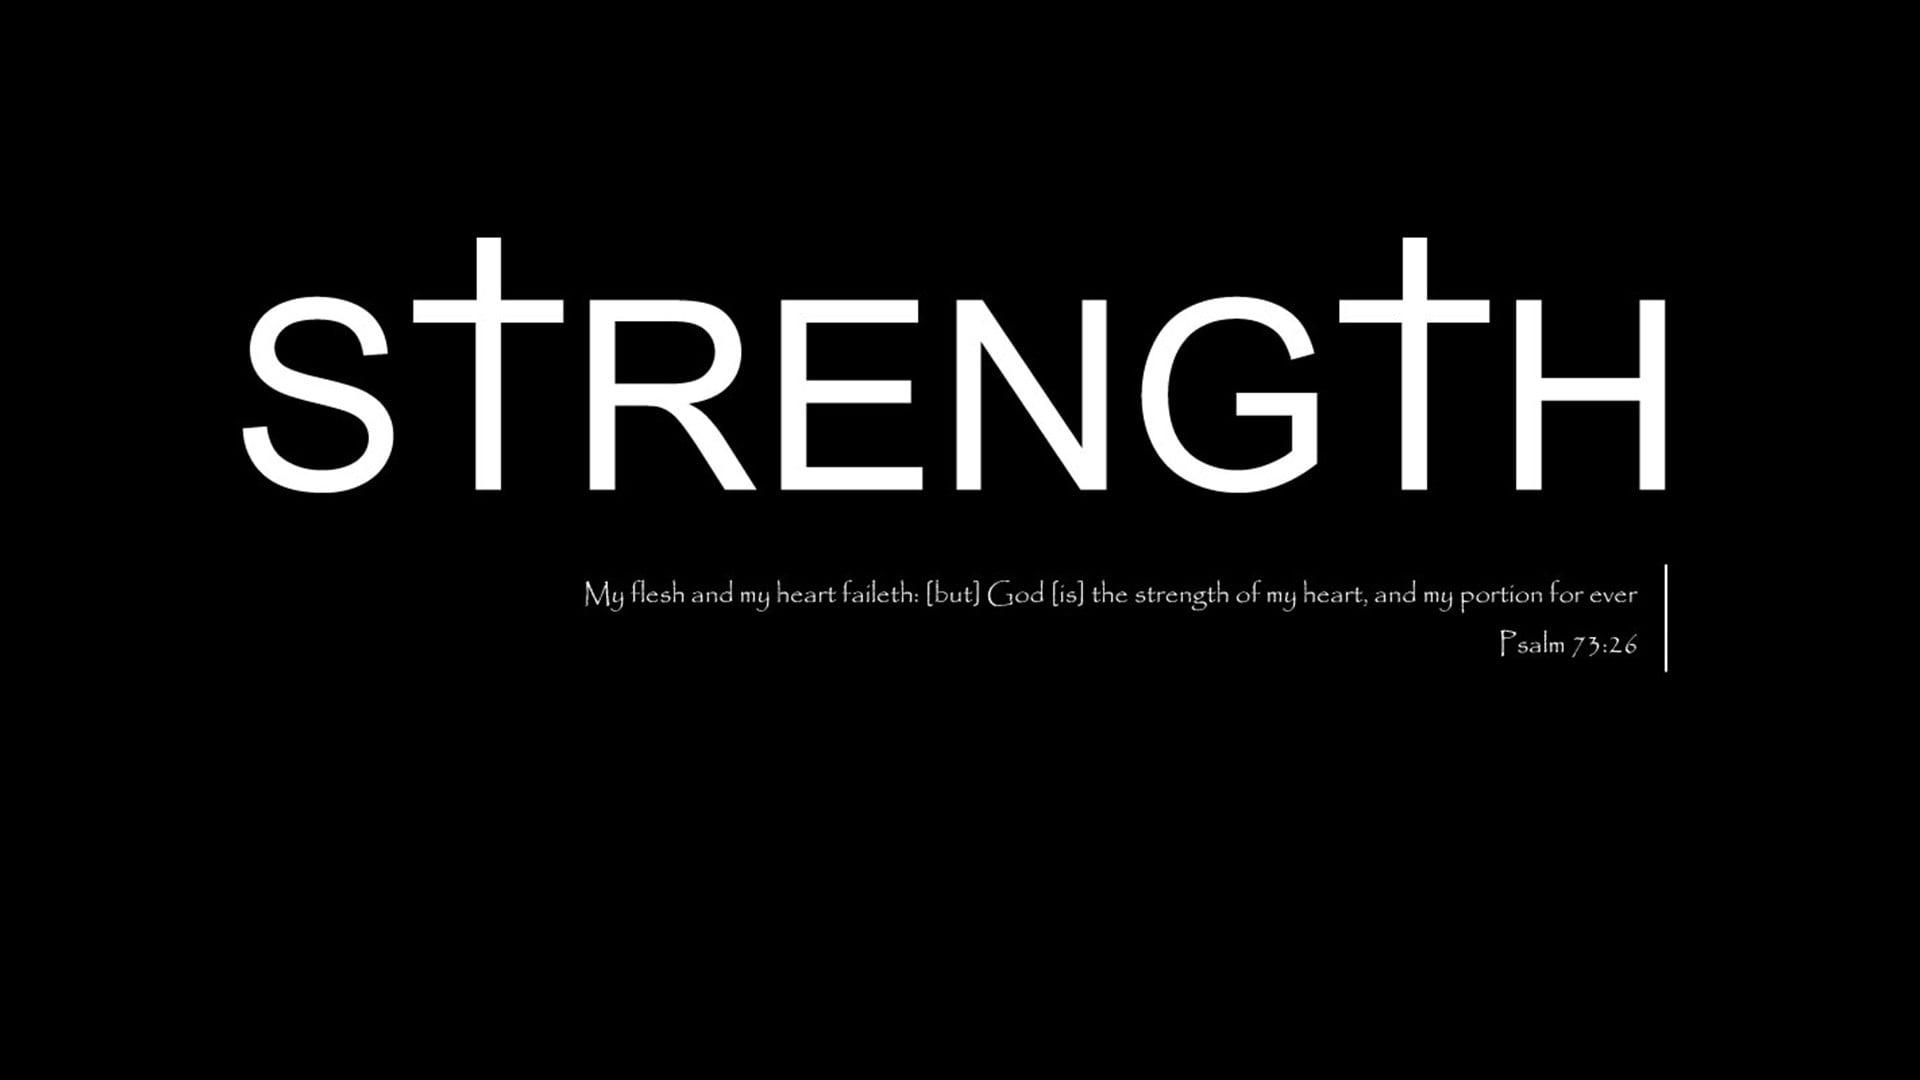 Strength text on black bacground God Jesus Christ Christianity 1920x1080